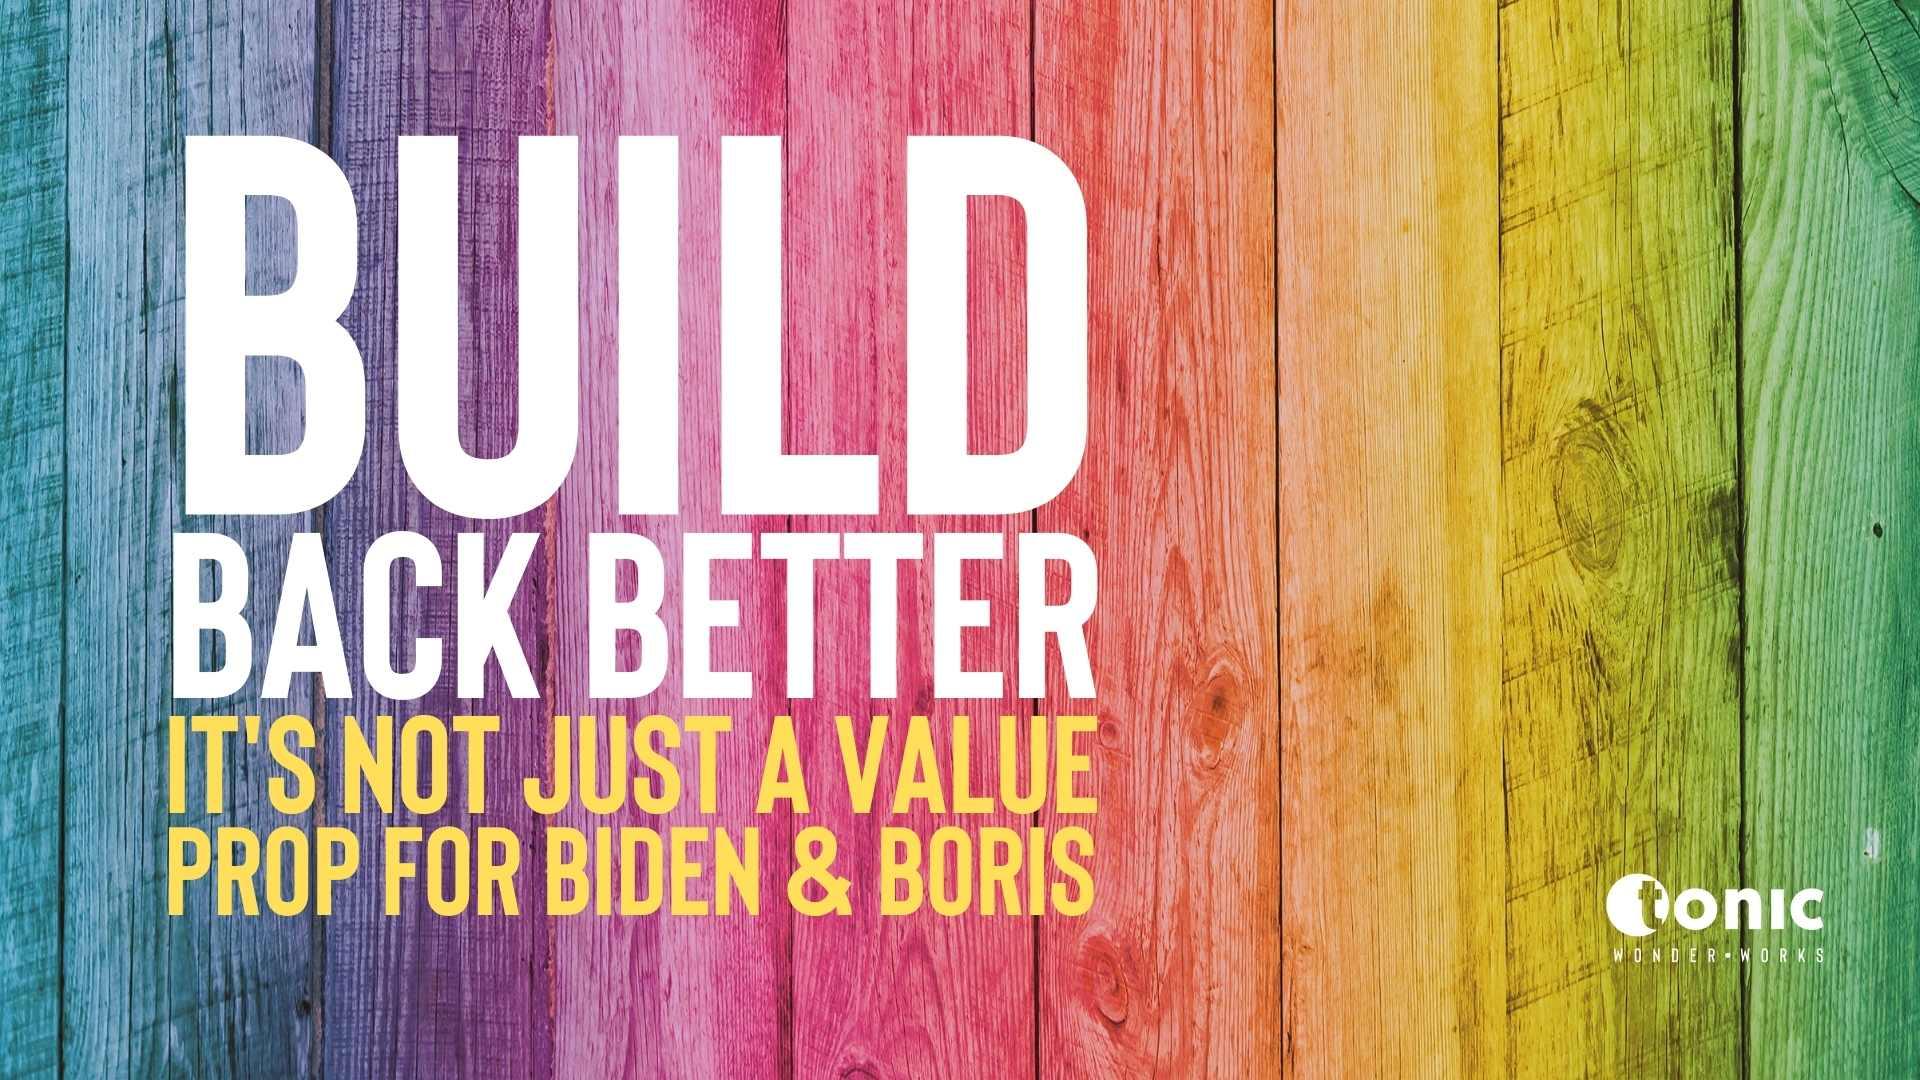 Build back better. A value prop that's Not just for Biden & Boris